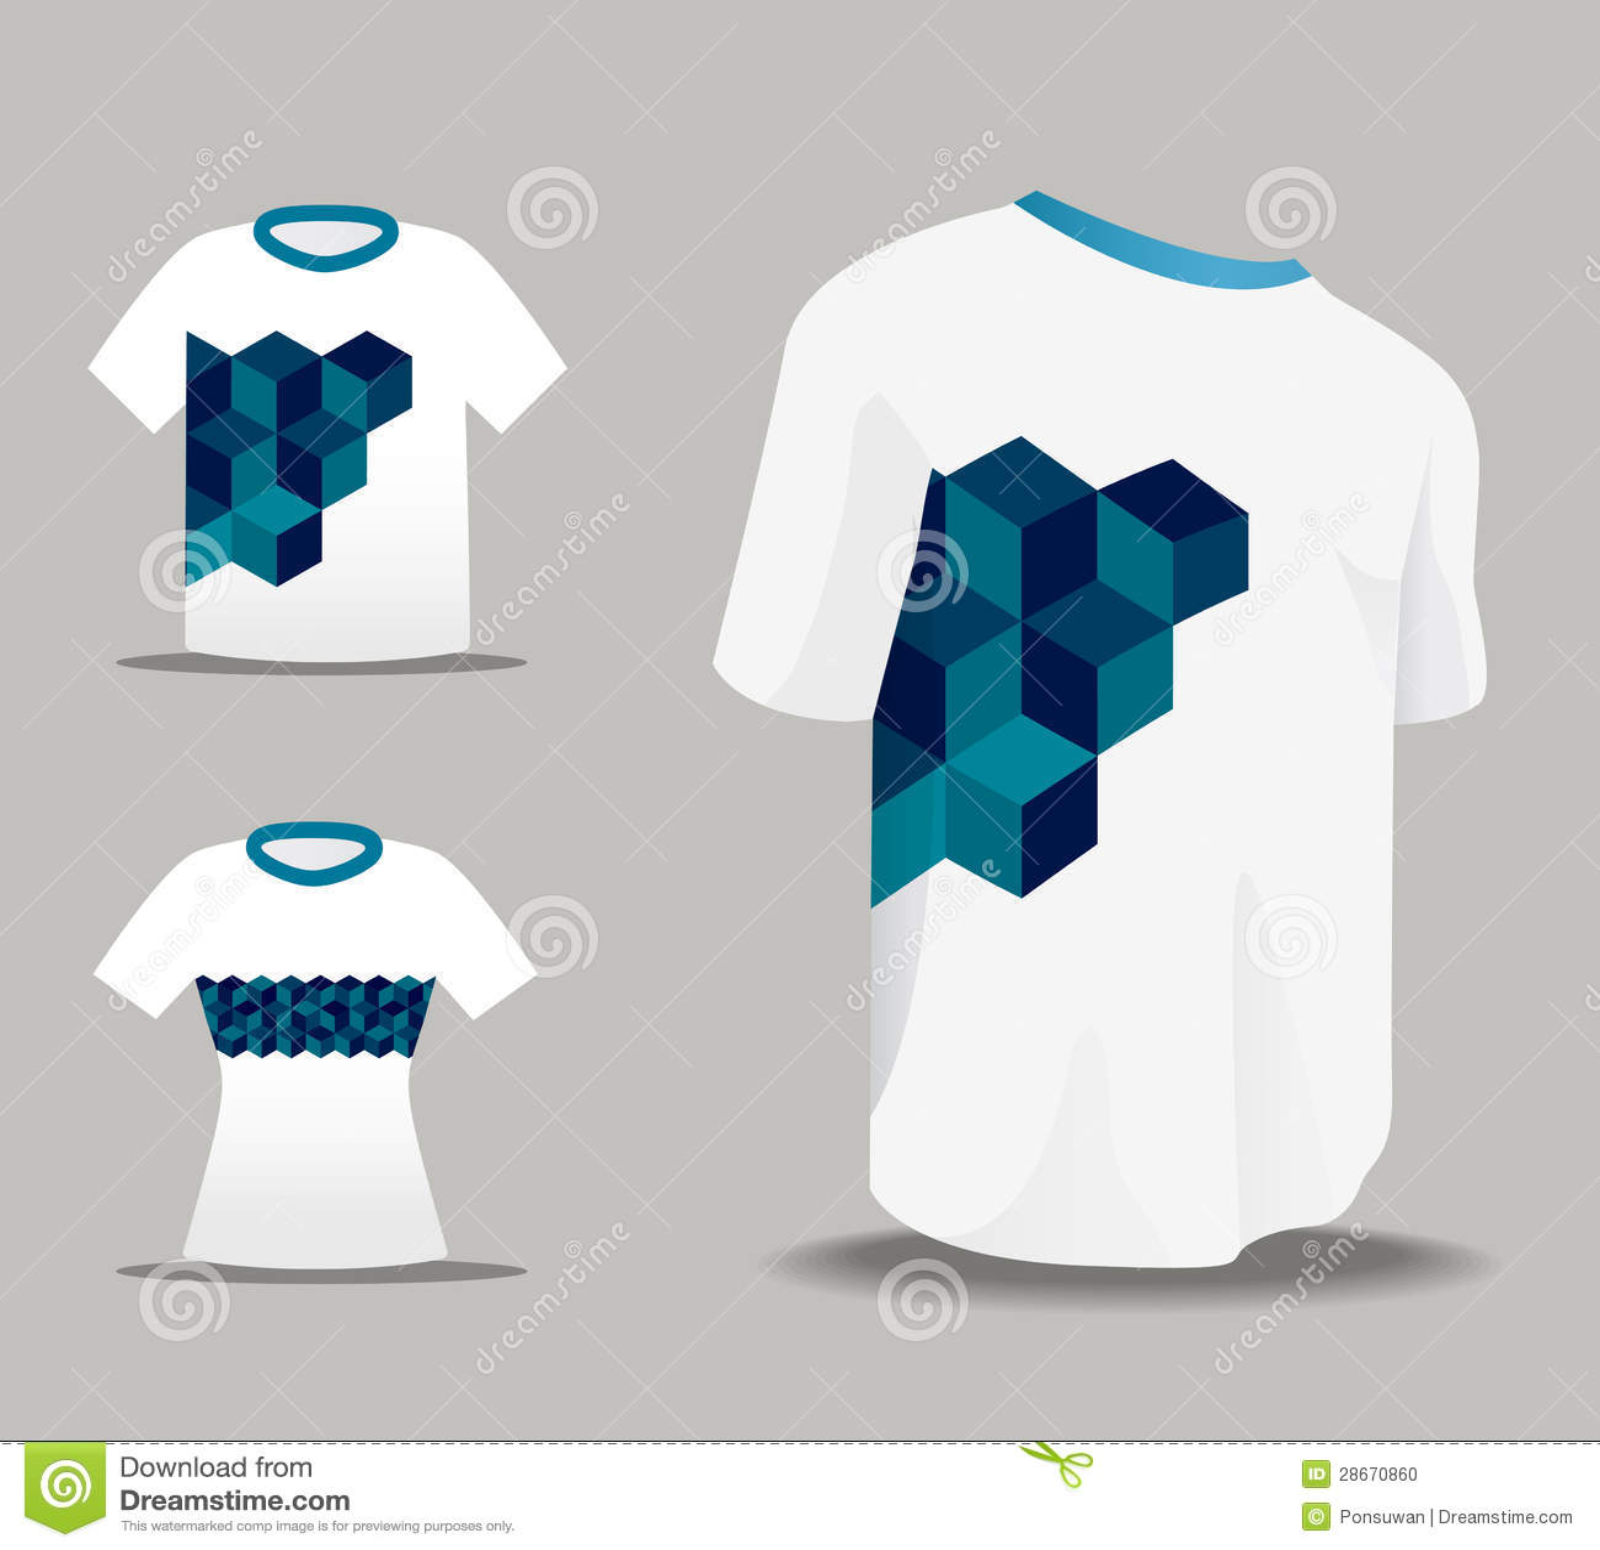 Corel Draw X T Shirt Design